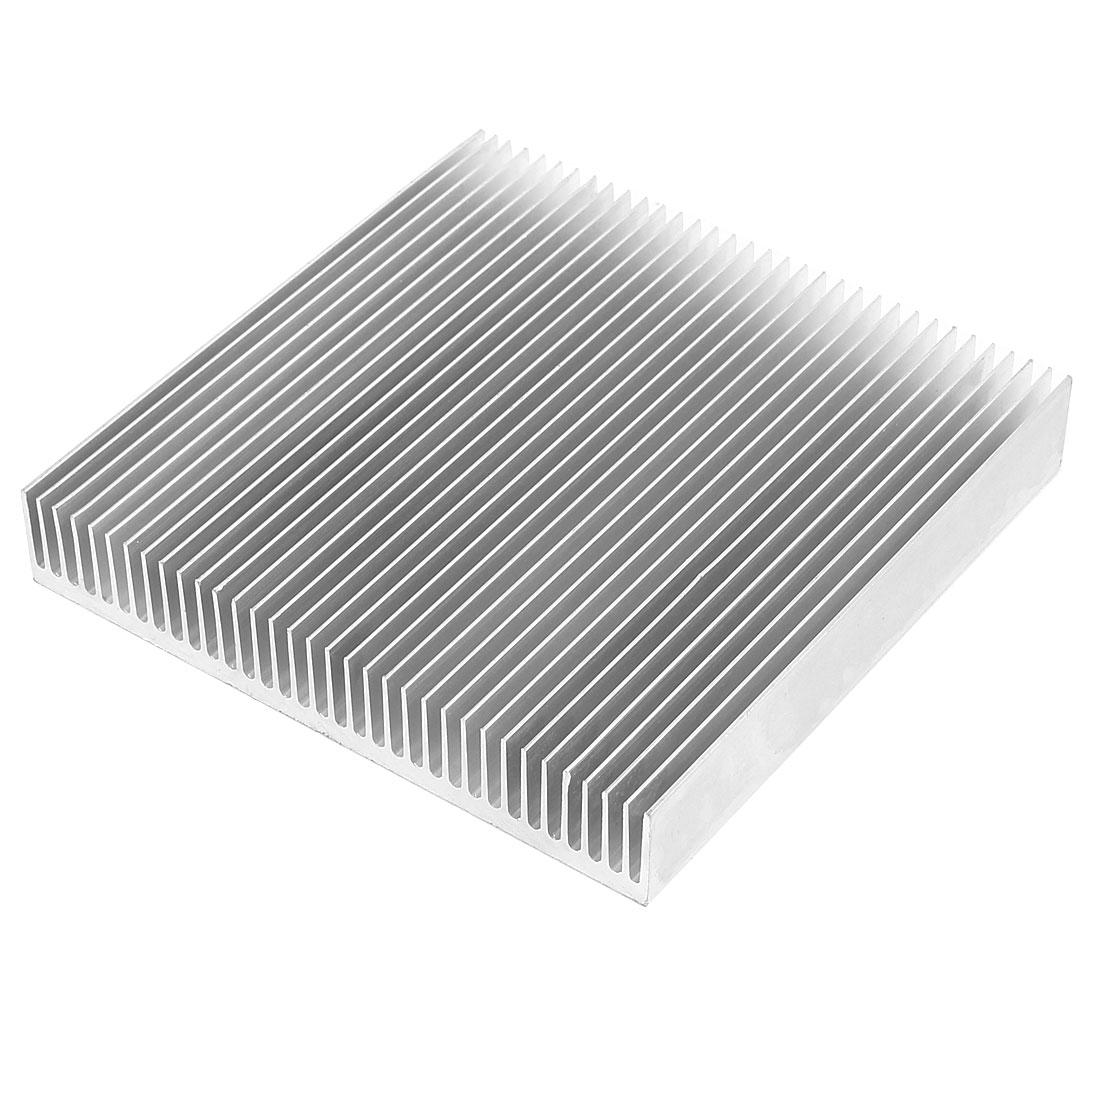 Silver Tone Aluminum Cooler Radiator Heat Sink Heatsink 90mm x 90mm x 15mm